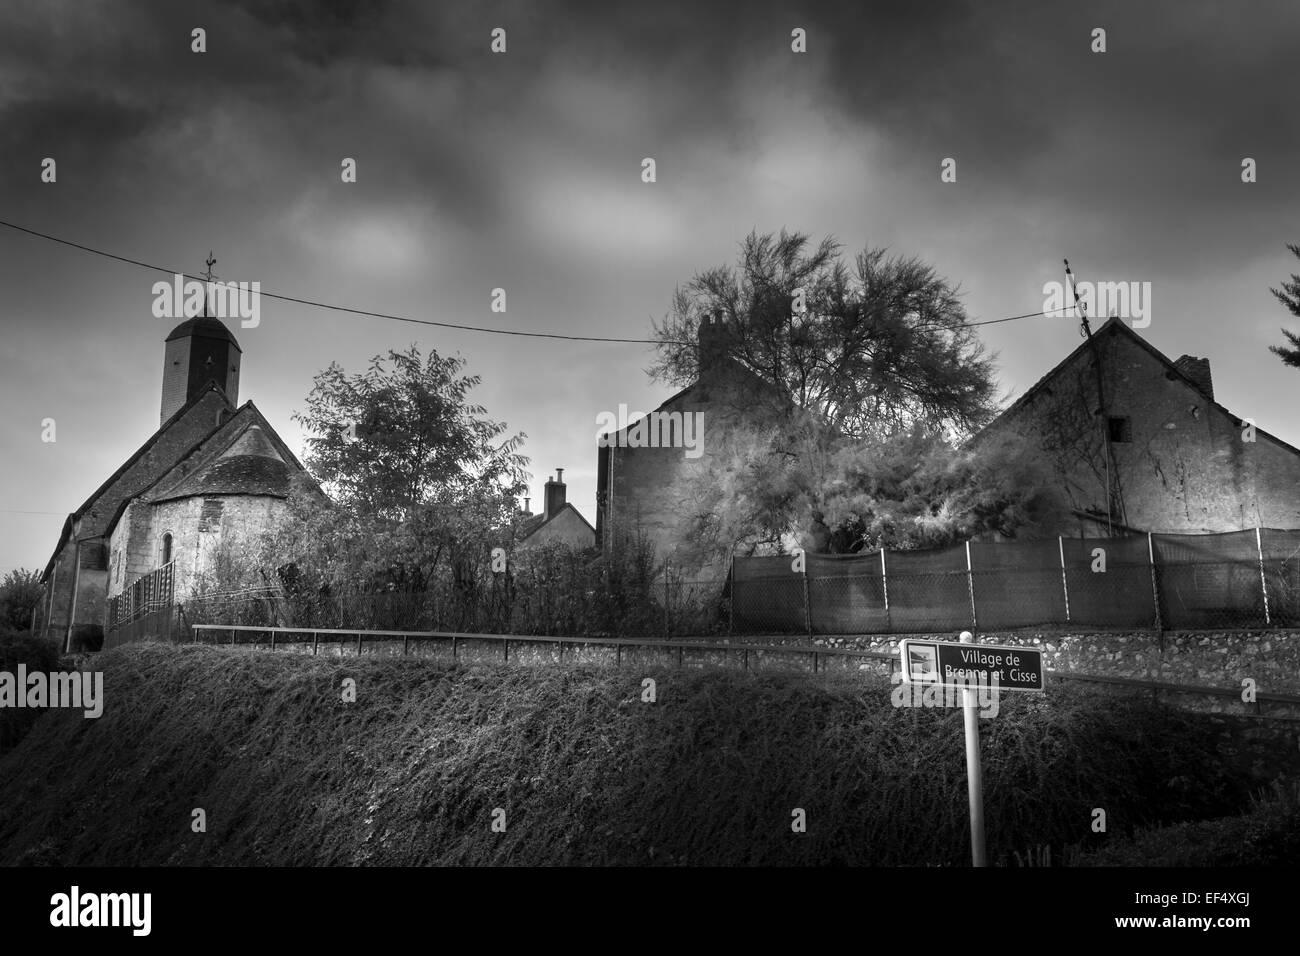 Buildings sitting on a hill, neuille-le-lierre village, Indre-et-Loire, France. - Stock Image